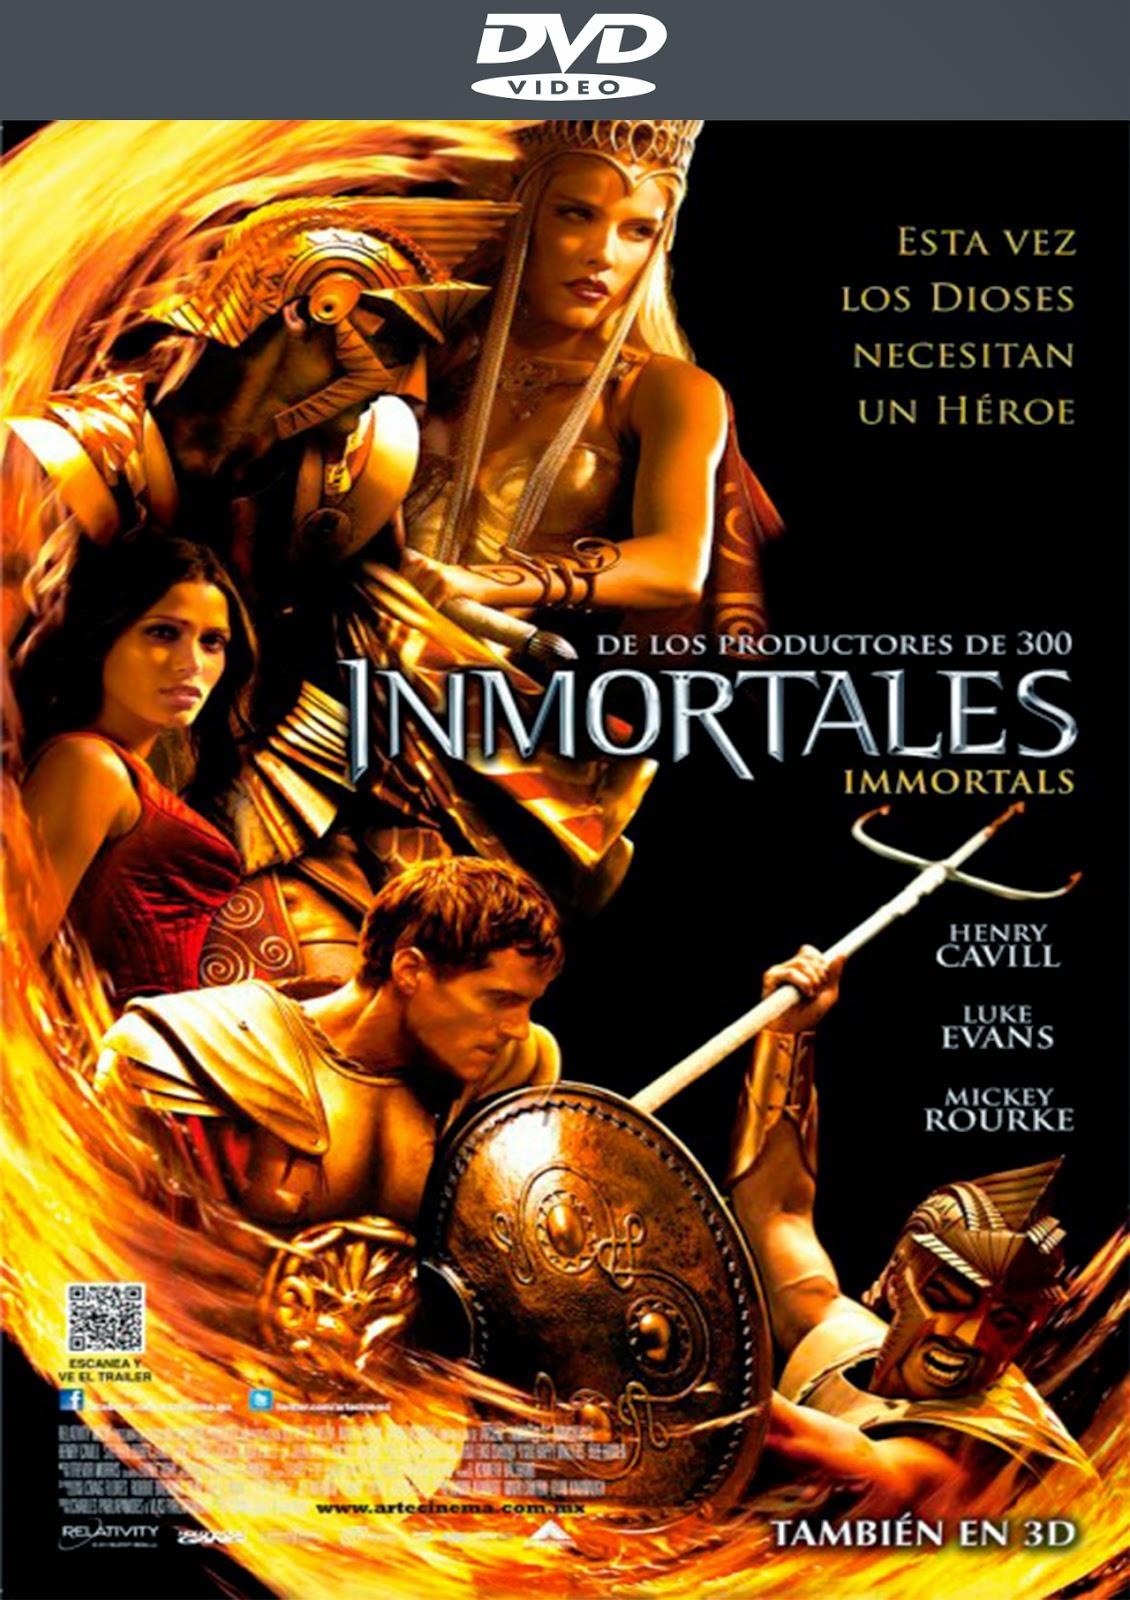 Inmortales [2011] [Latino/Ingles]